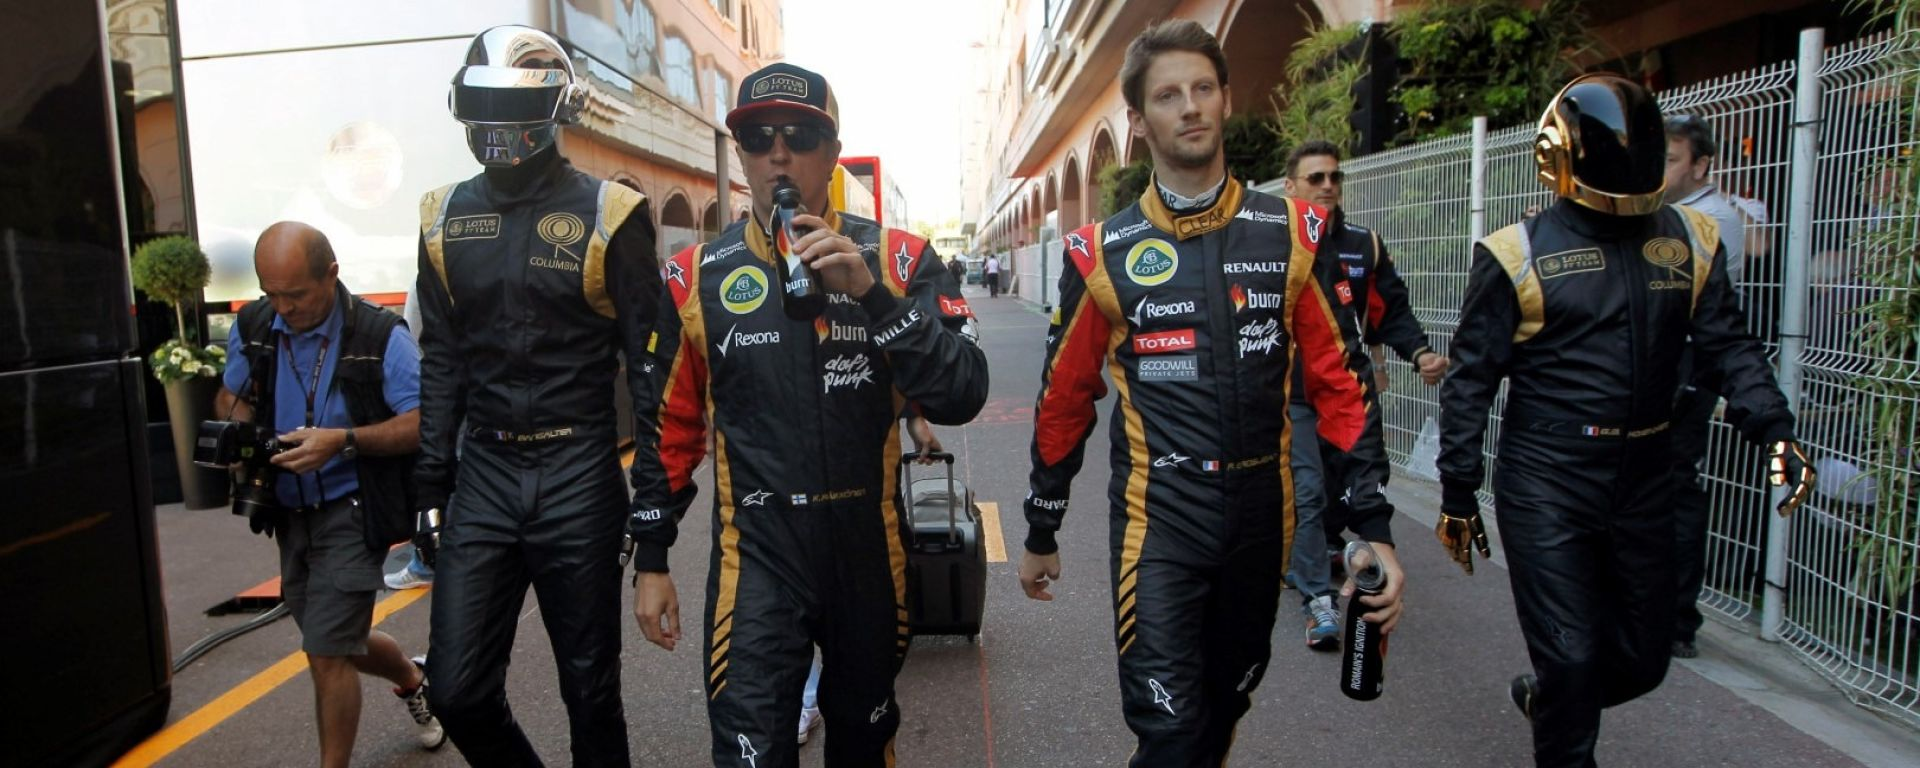 F1, GP Monaco 2013: Kimi Raikkonen e Romain Grosjean (Lotus) accompagnati dai Daft Punk